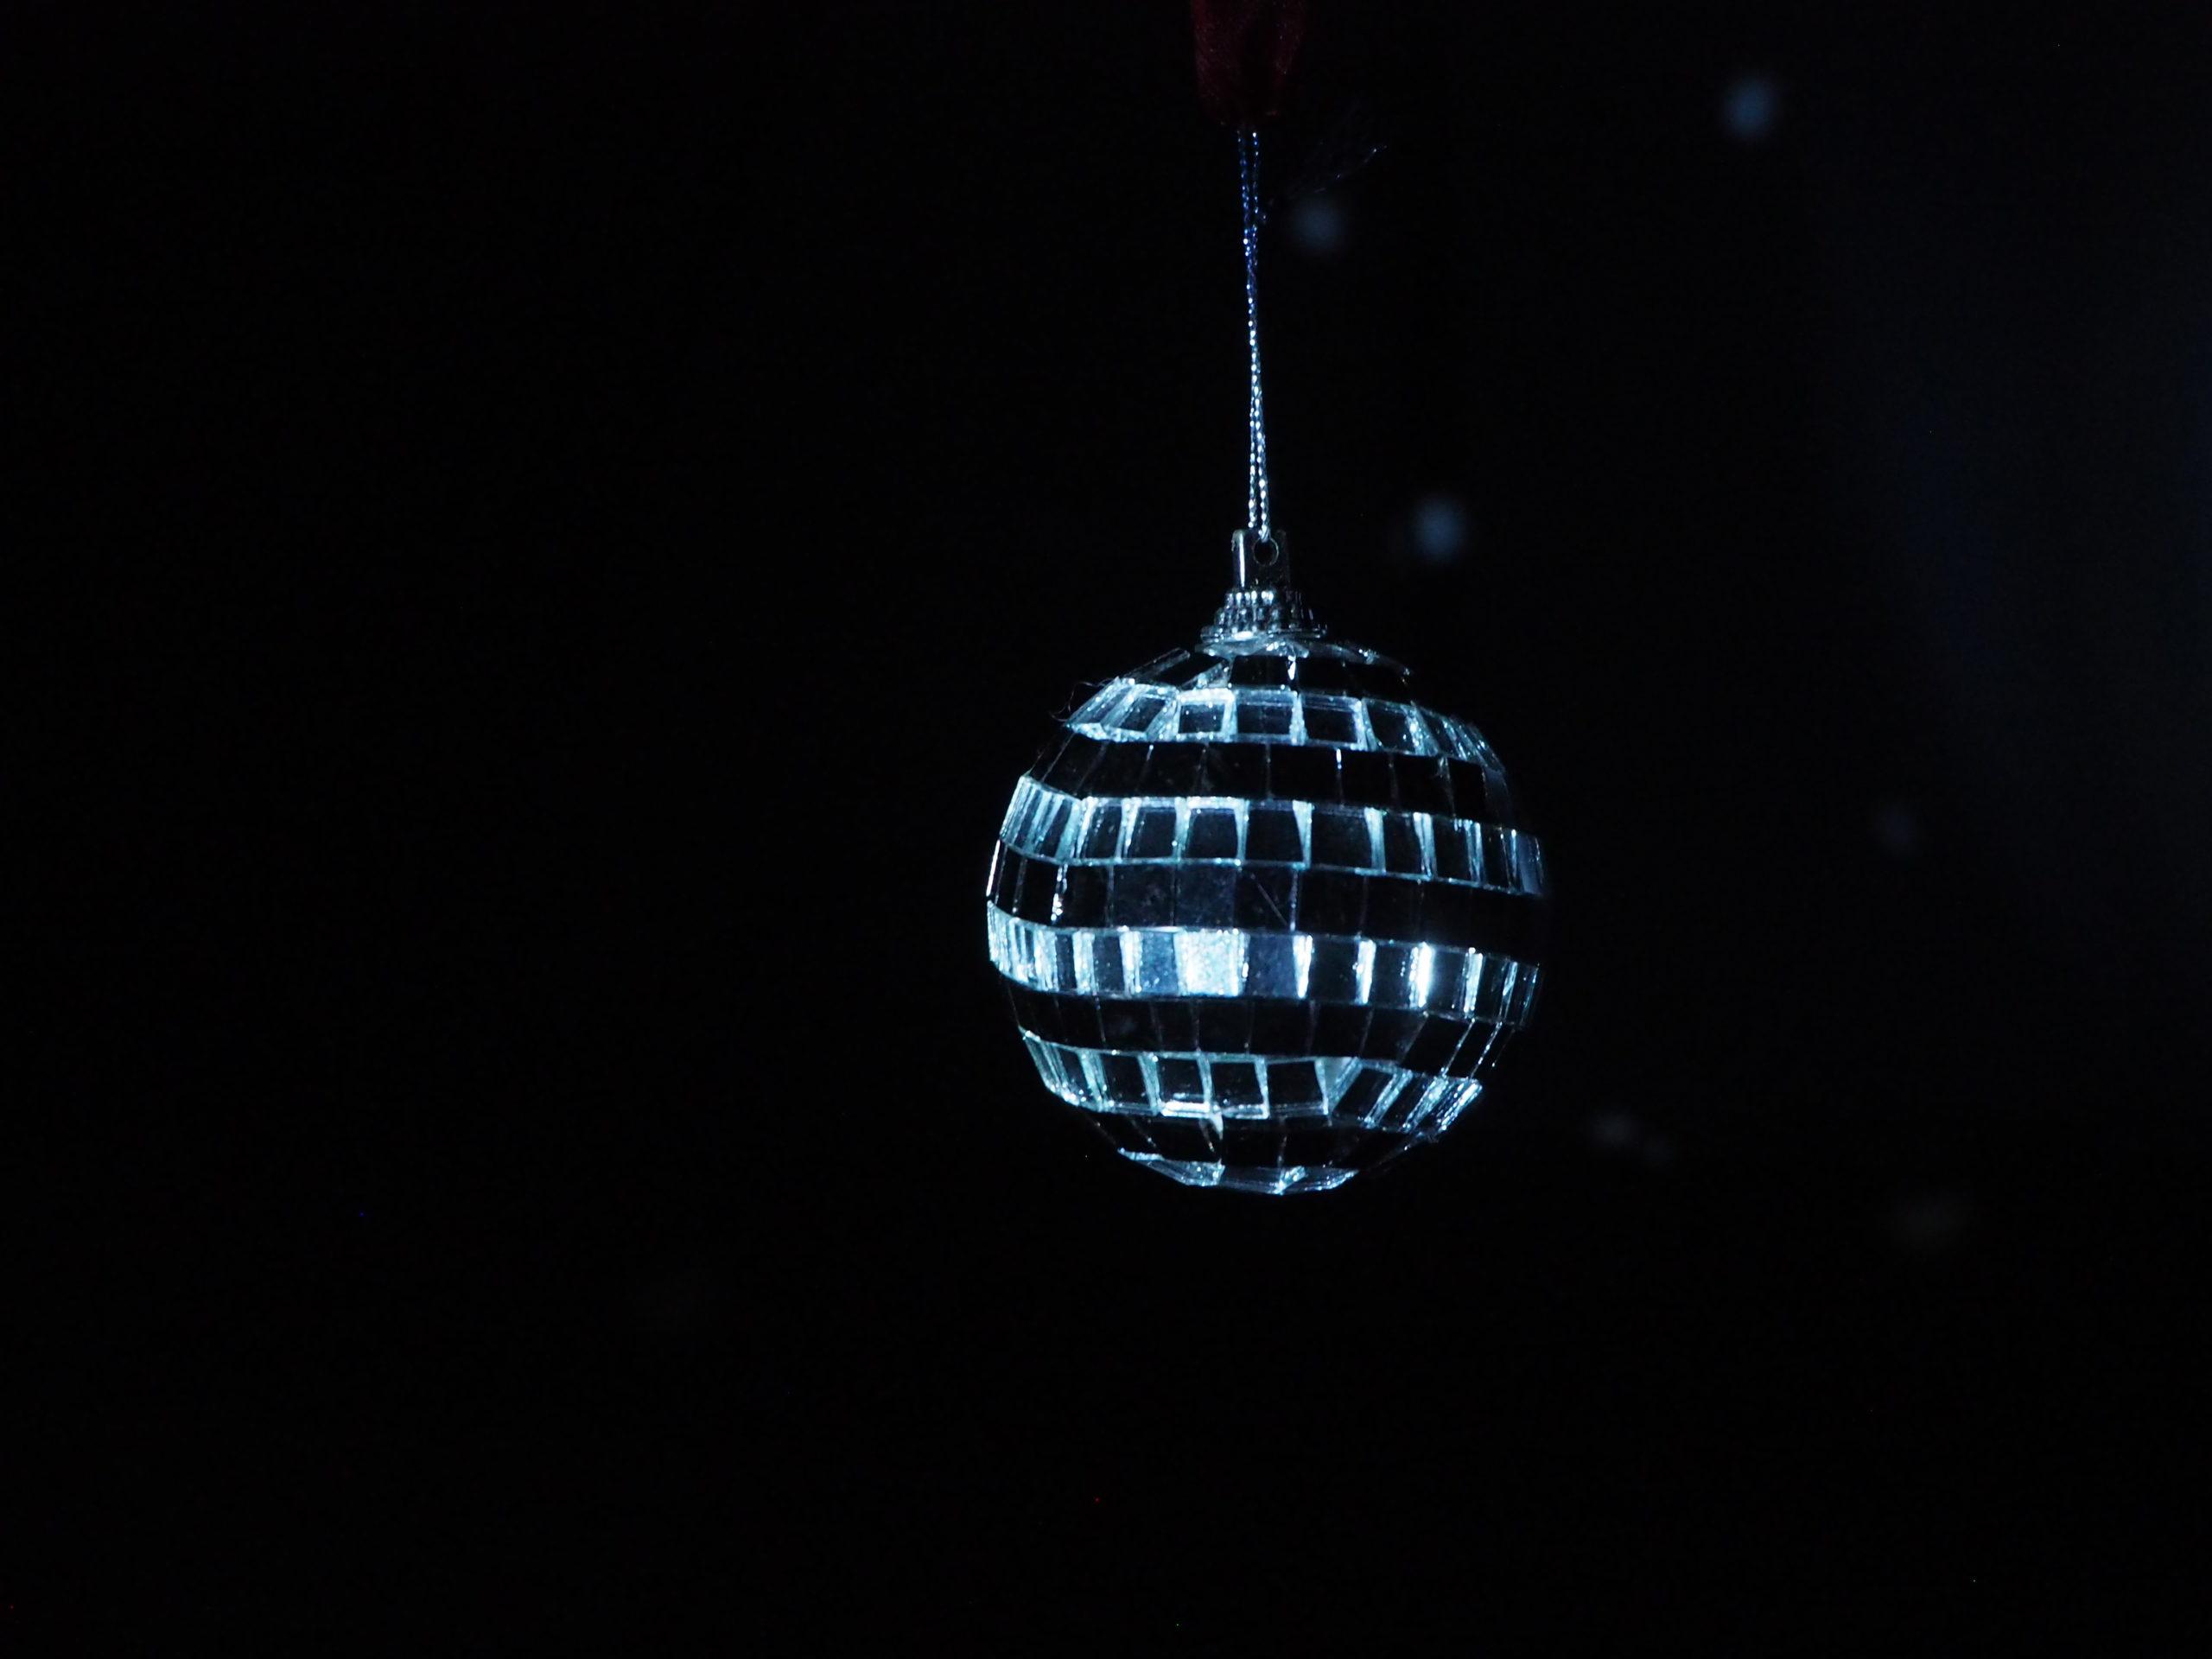 Просто фото  Новогодний микрокосм